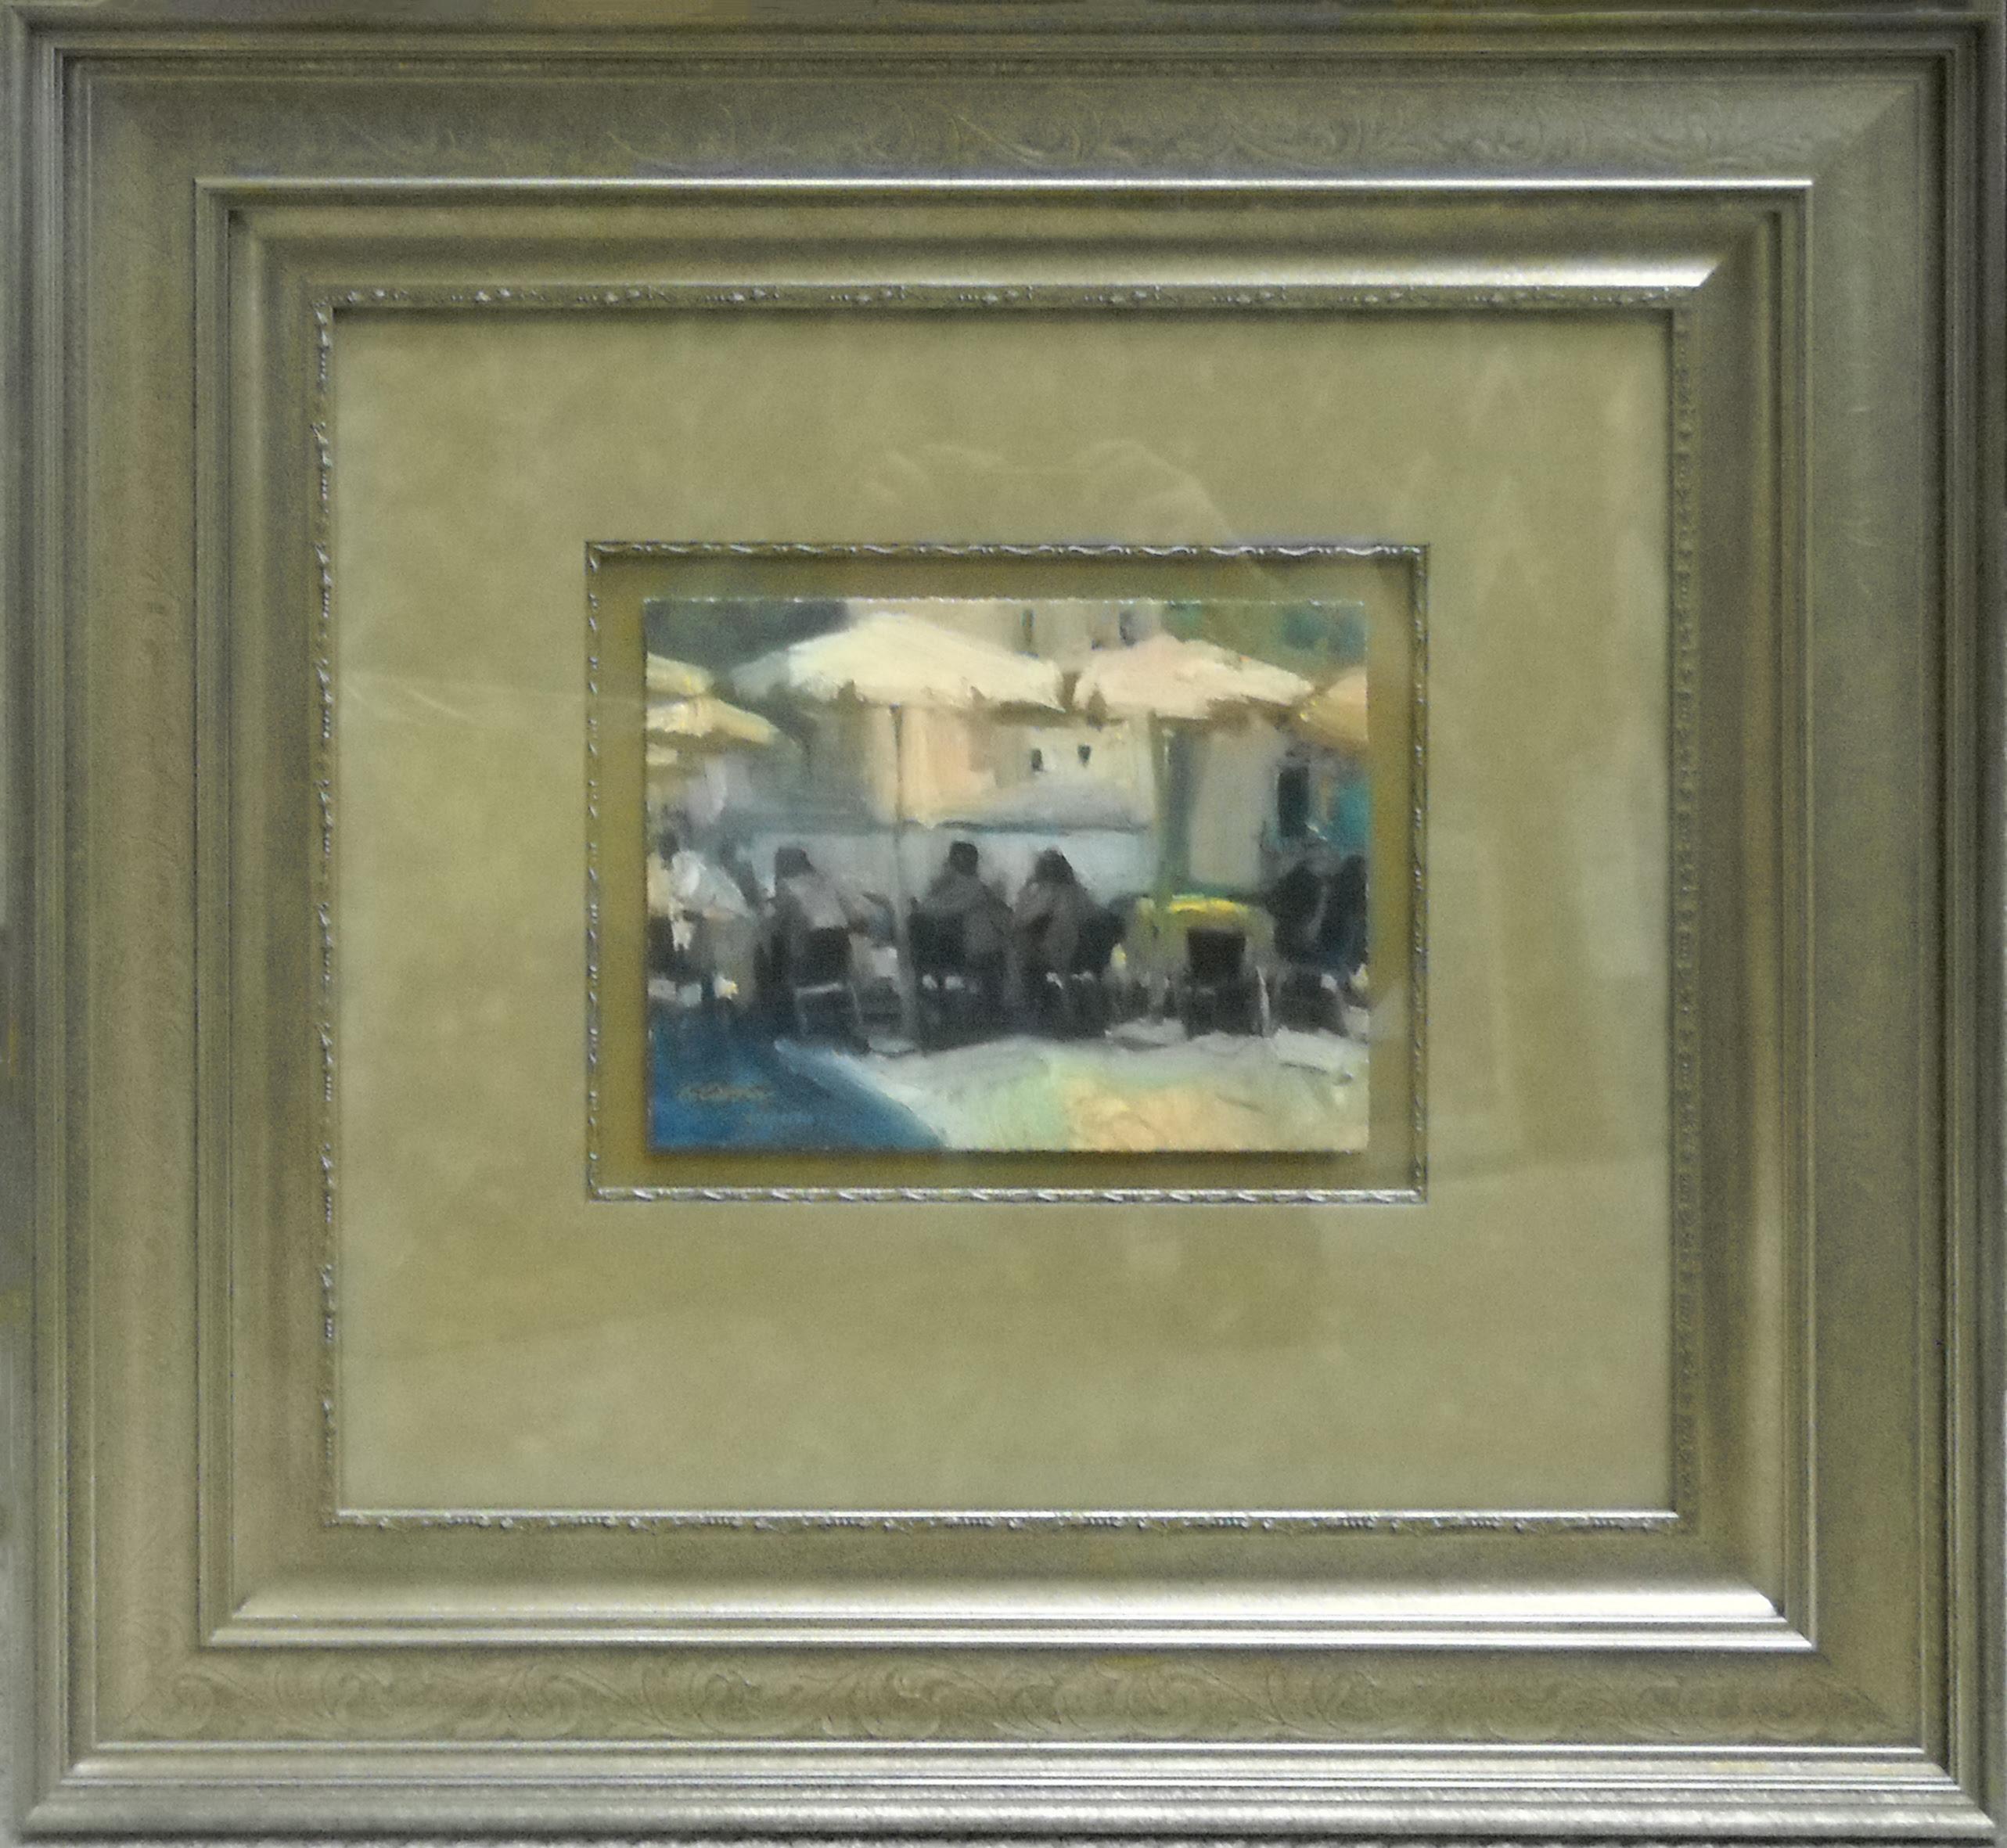 Frames For Sale At Goleta And Santa Barbara The Frame Up